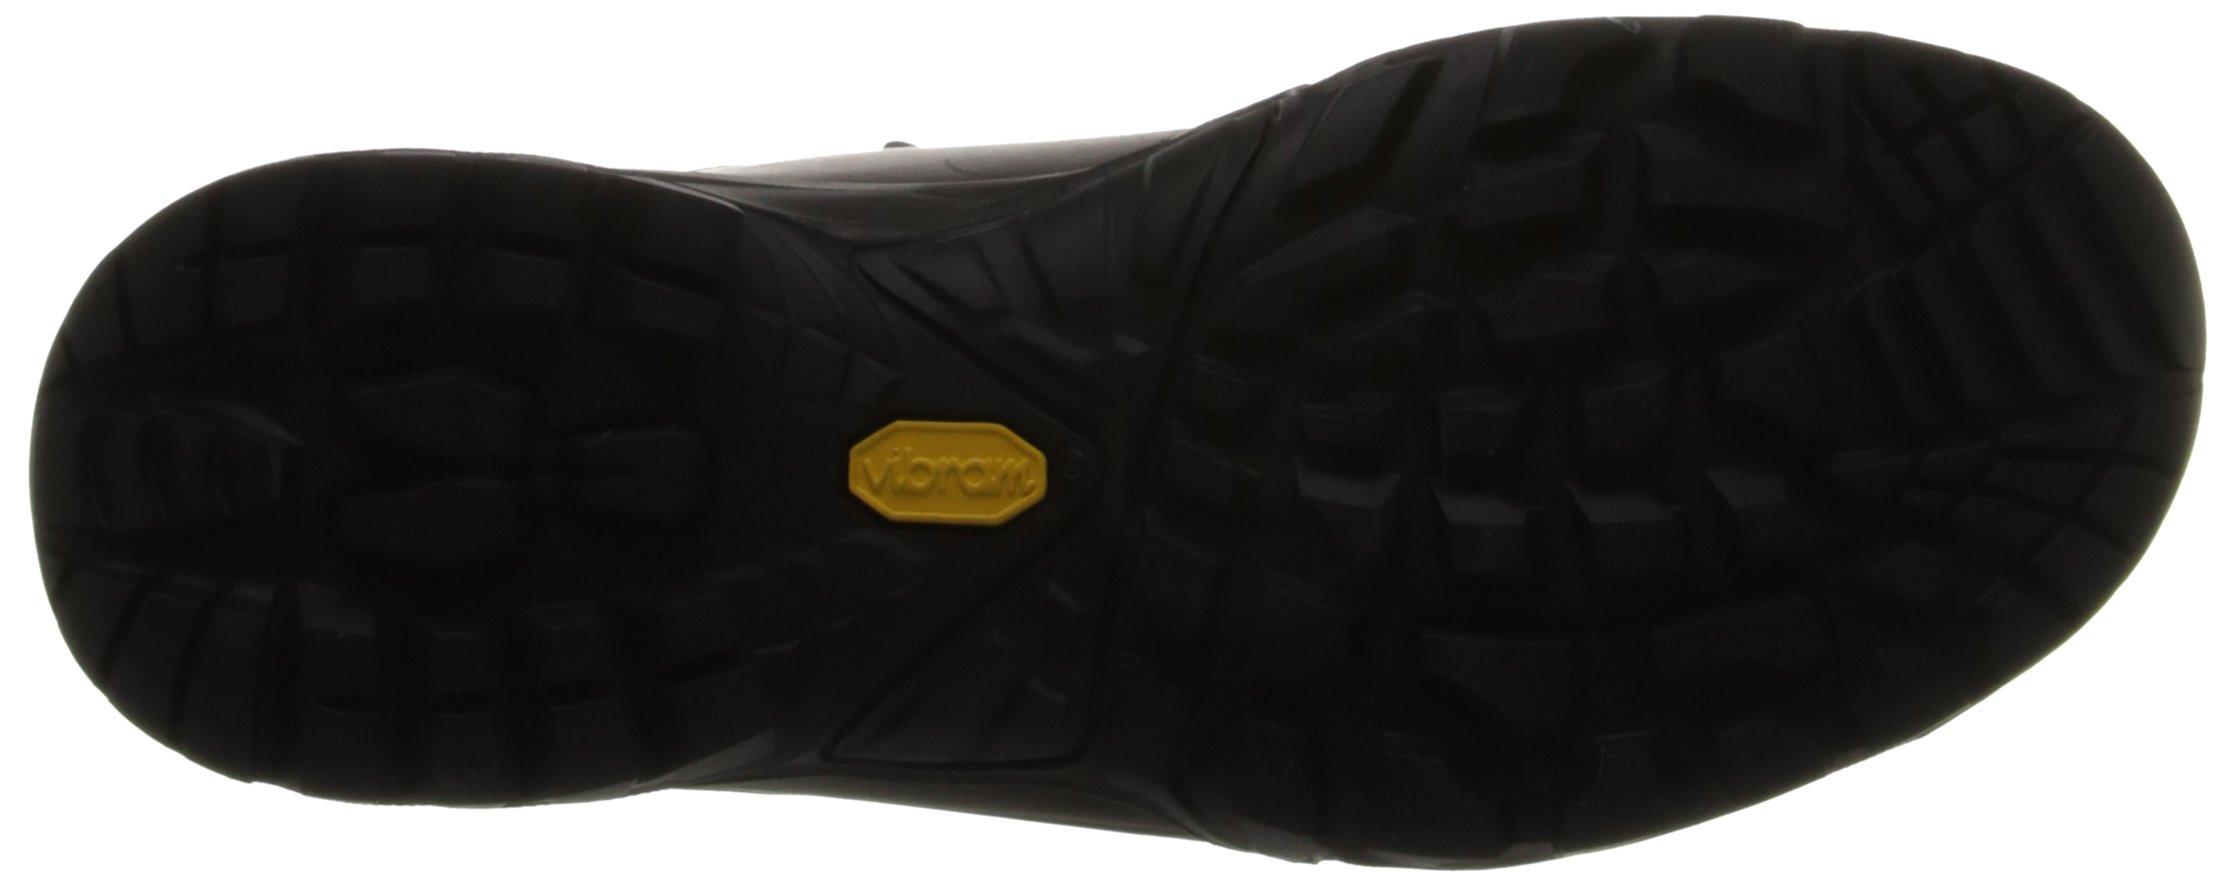 Scarpa Womens Women's Terra GTX Hiking Boot,Brown,42 EU/10 M US by SCARPA (Image #3)